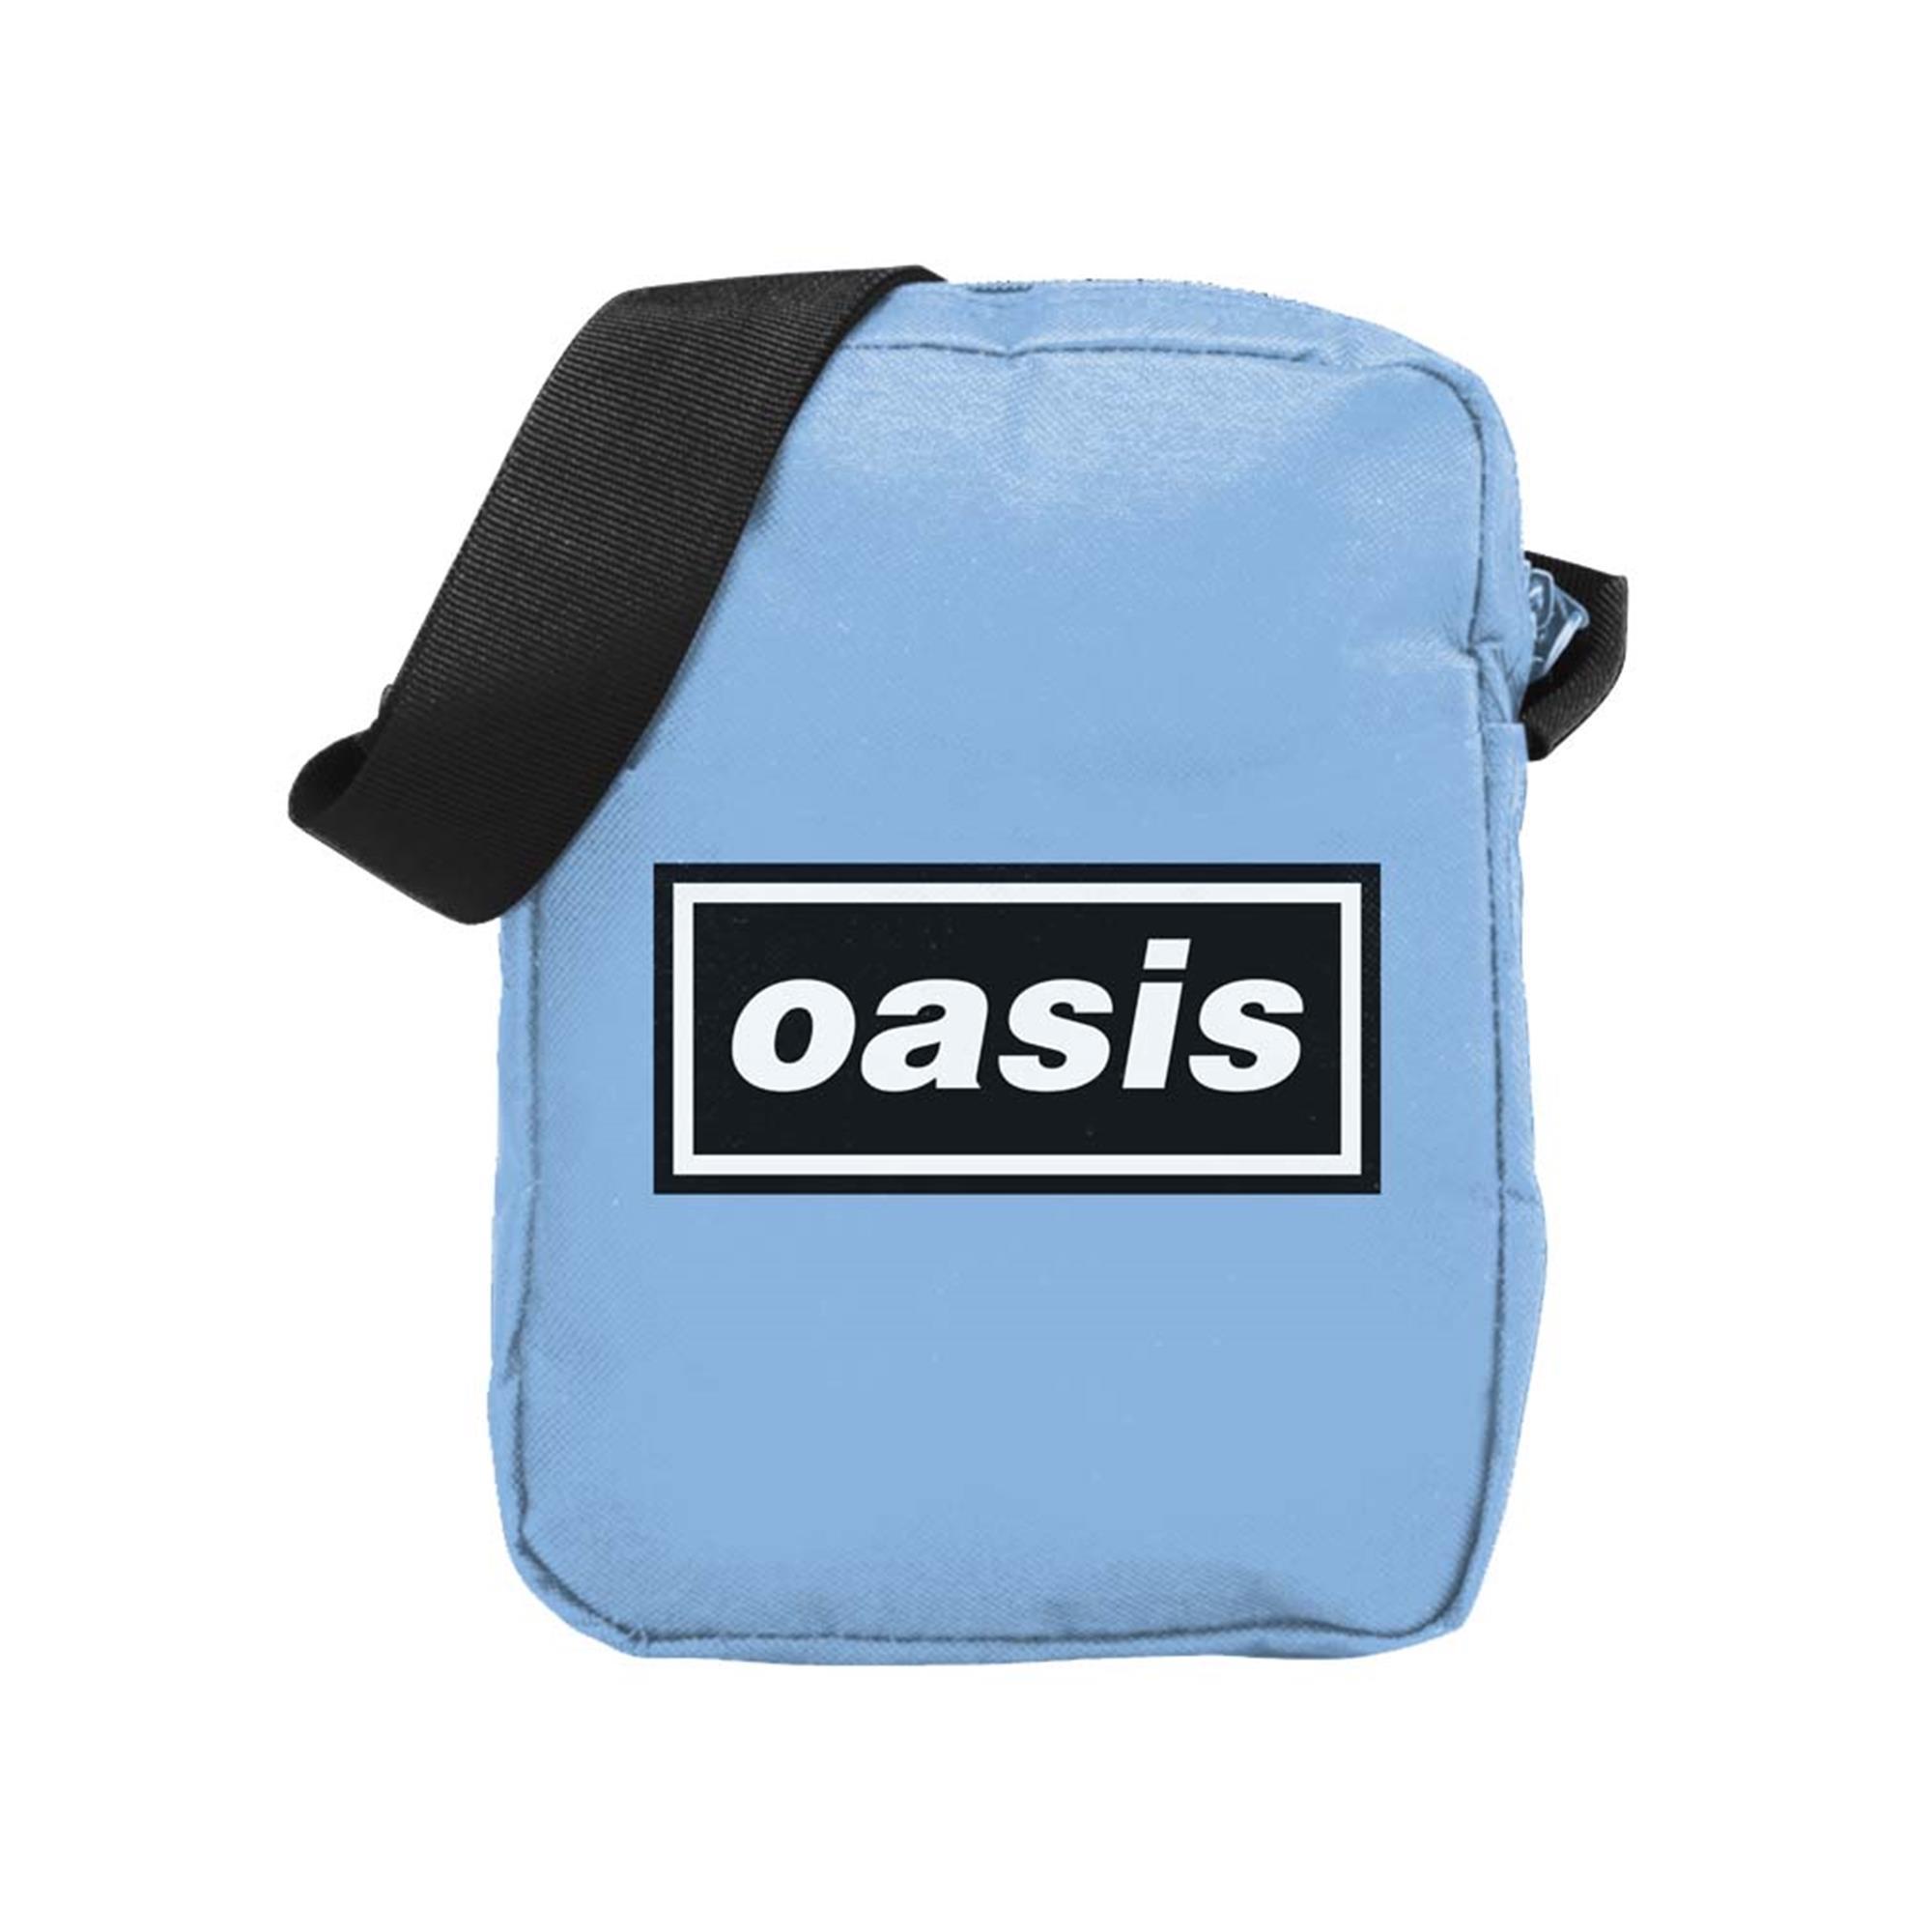 Oasis Blue Moon Crossbody bag